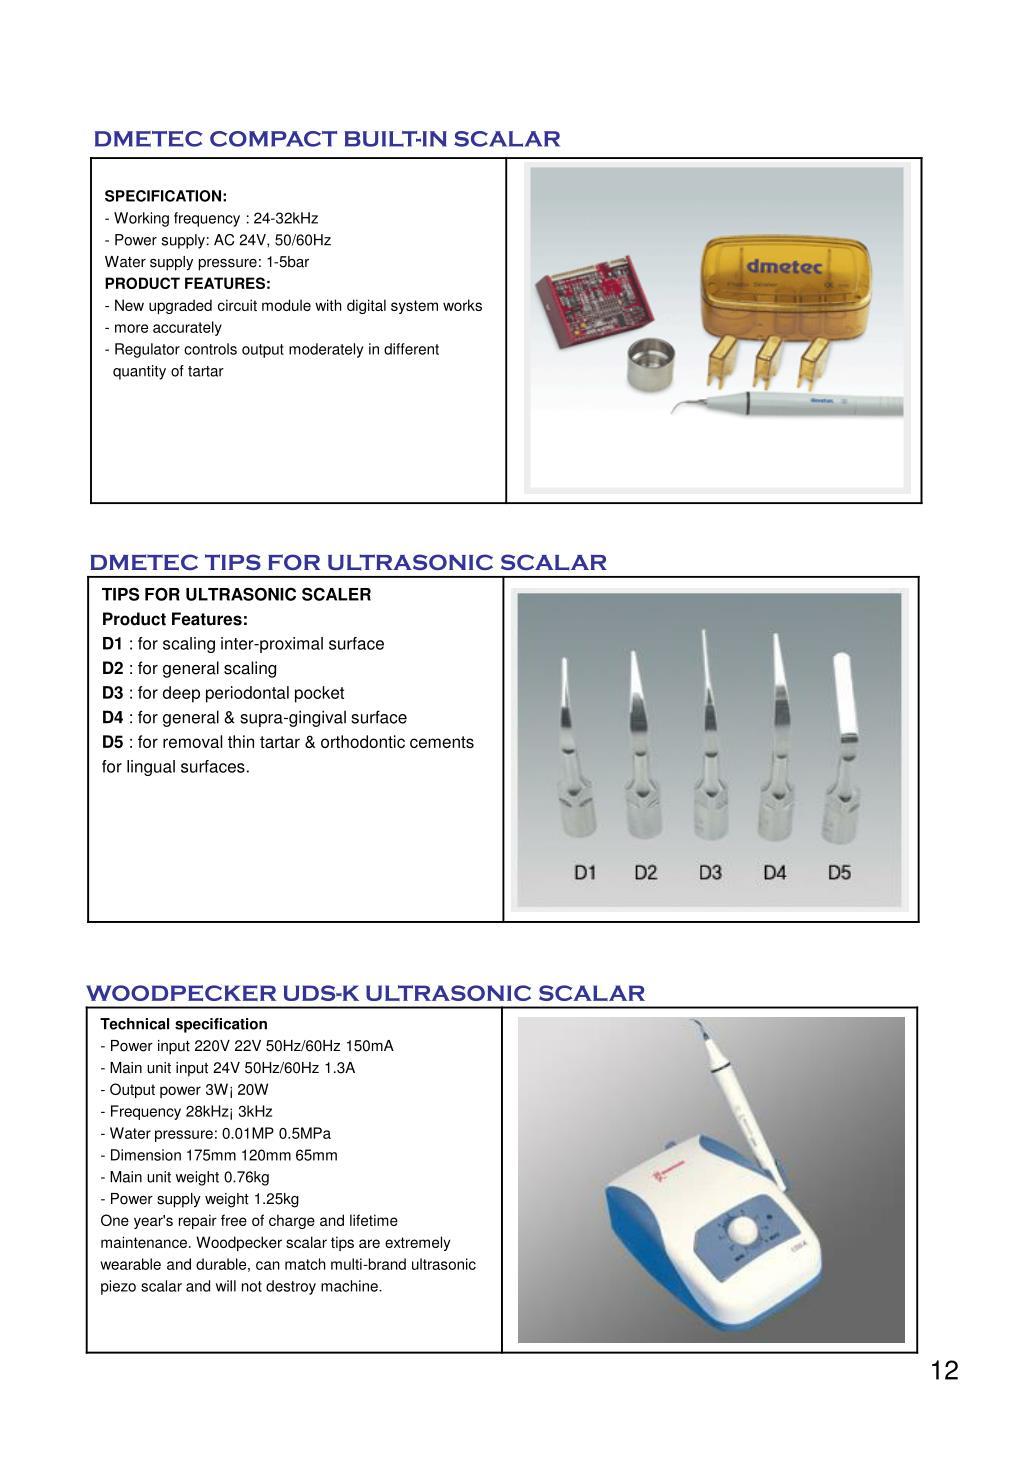 DMETEC COMPACT BUILT-IN SCALAR